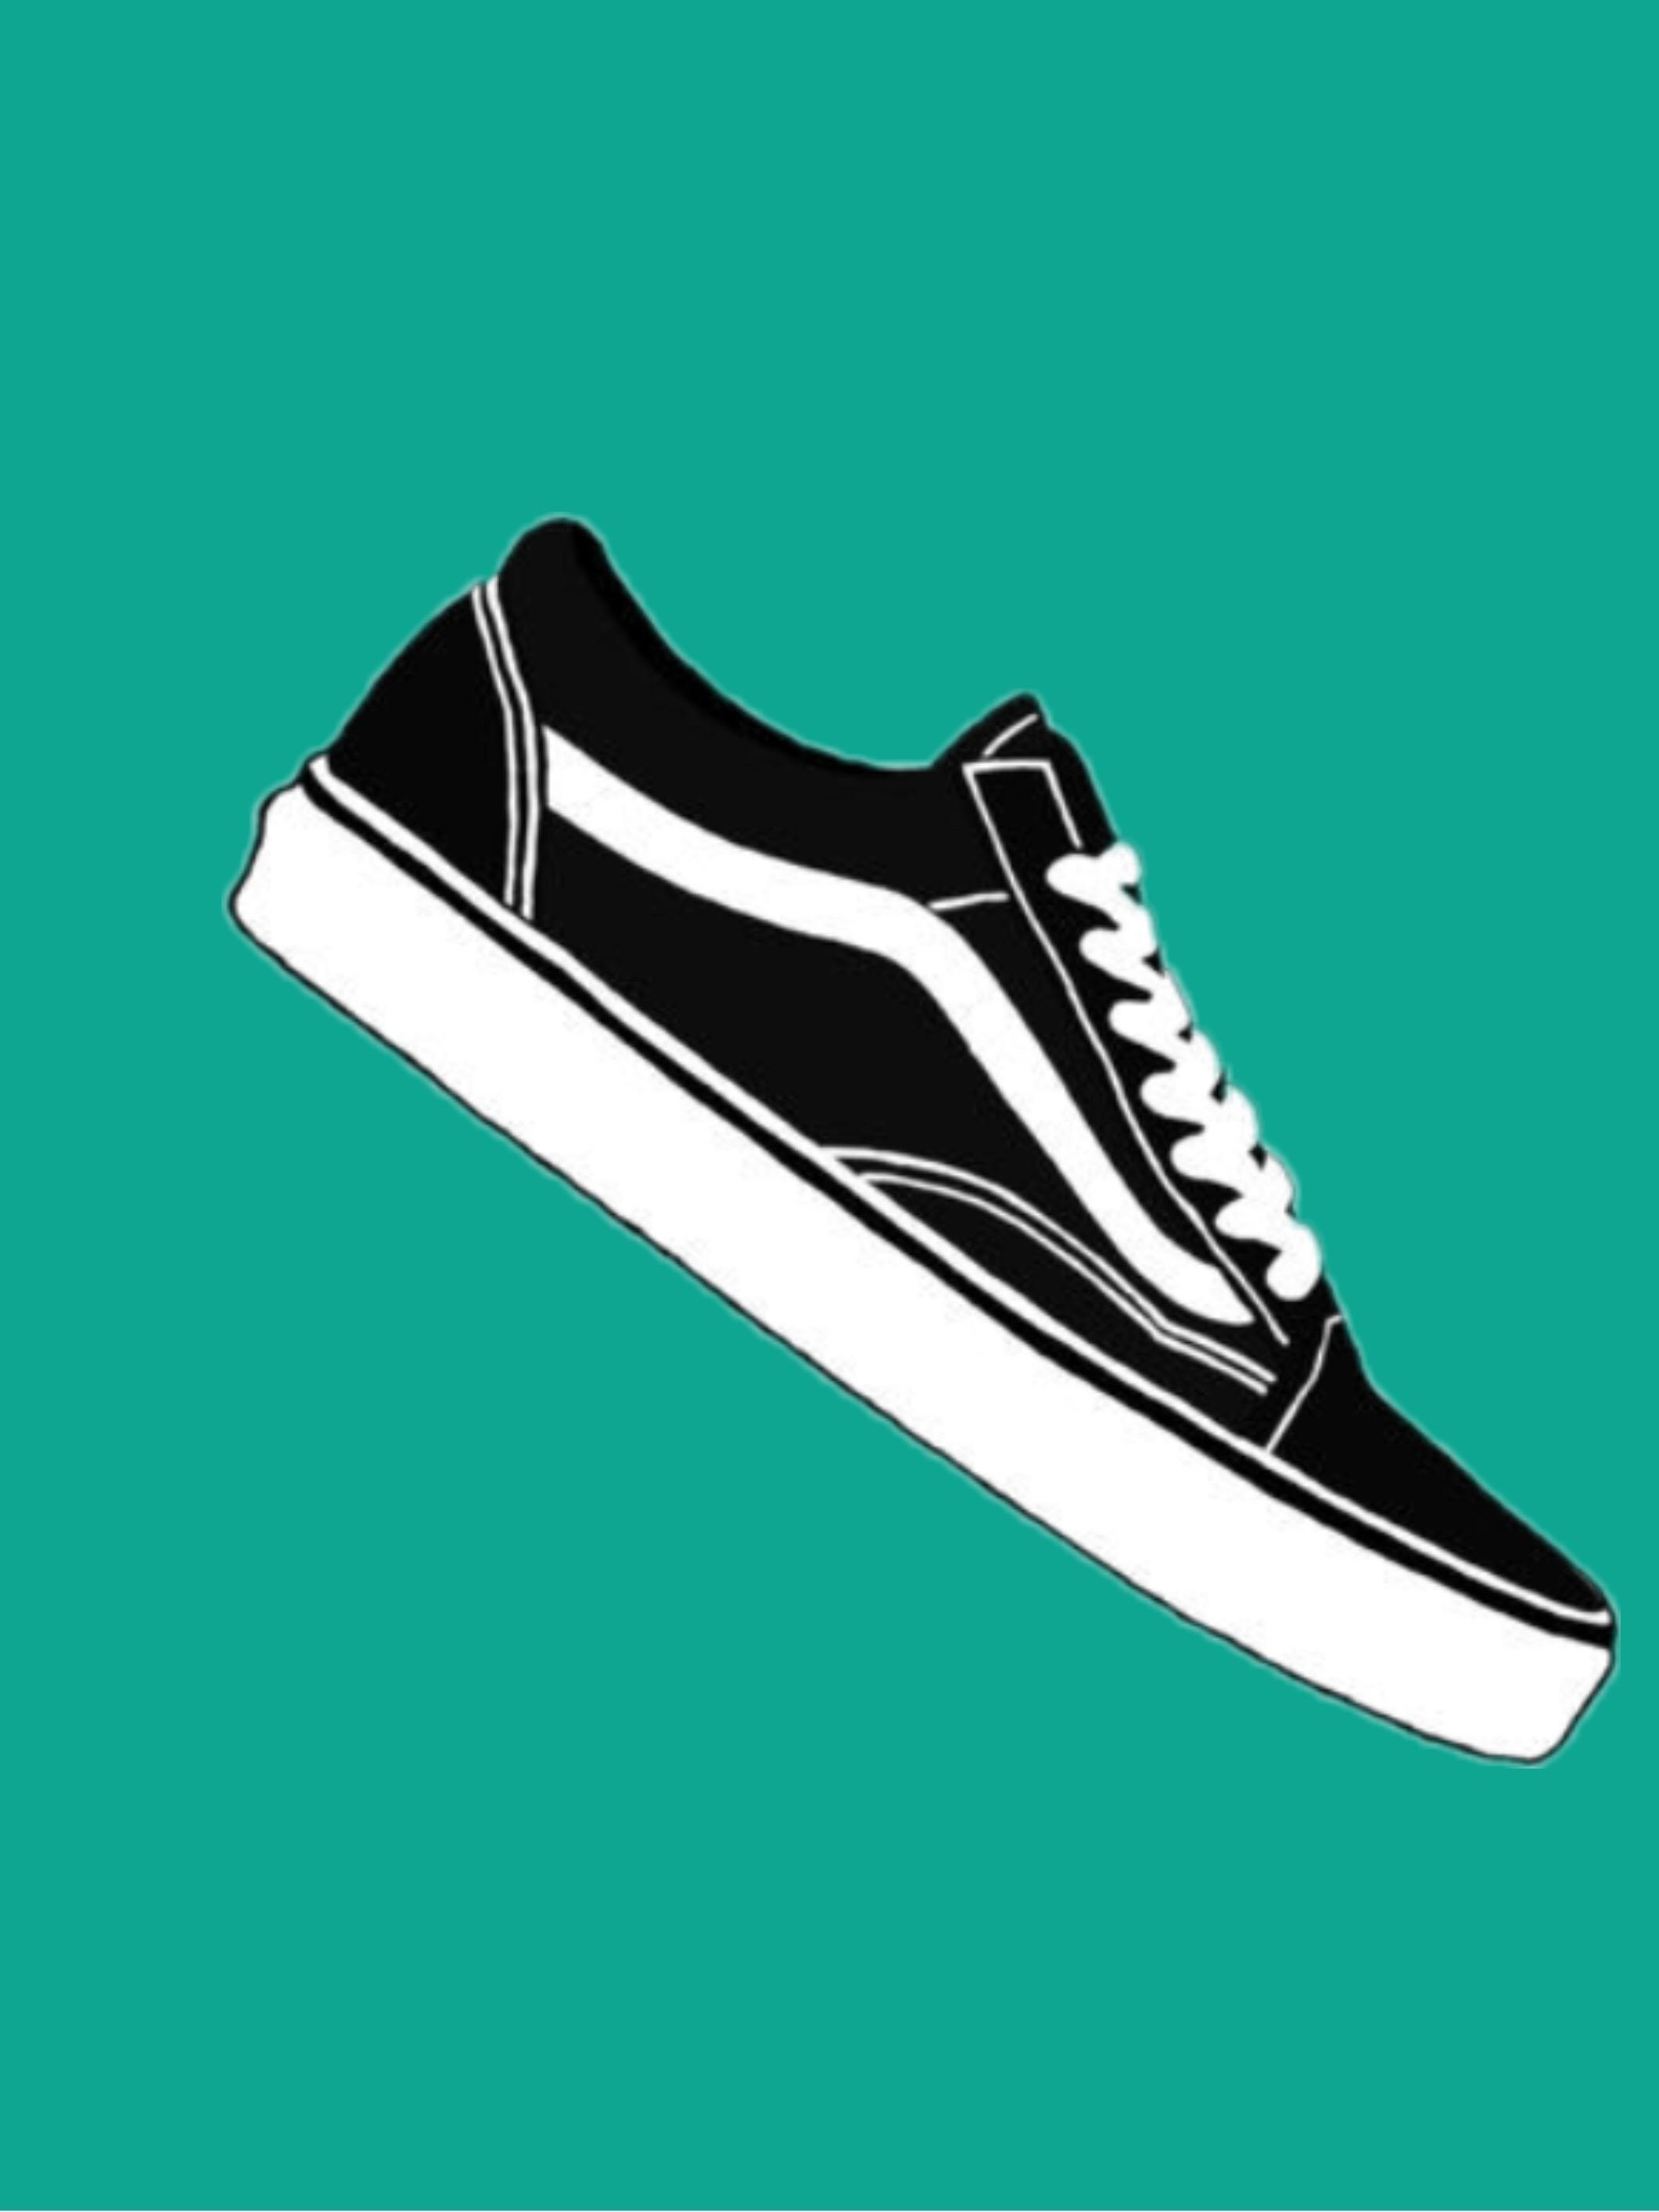 How To Draw Vans Shoes : shoes, اقتراح, تتحلل, احتفاظ, Shoes, Virelaine.org